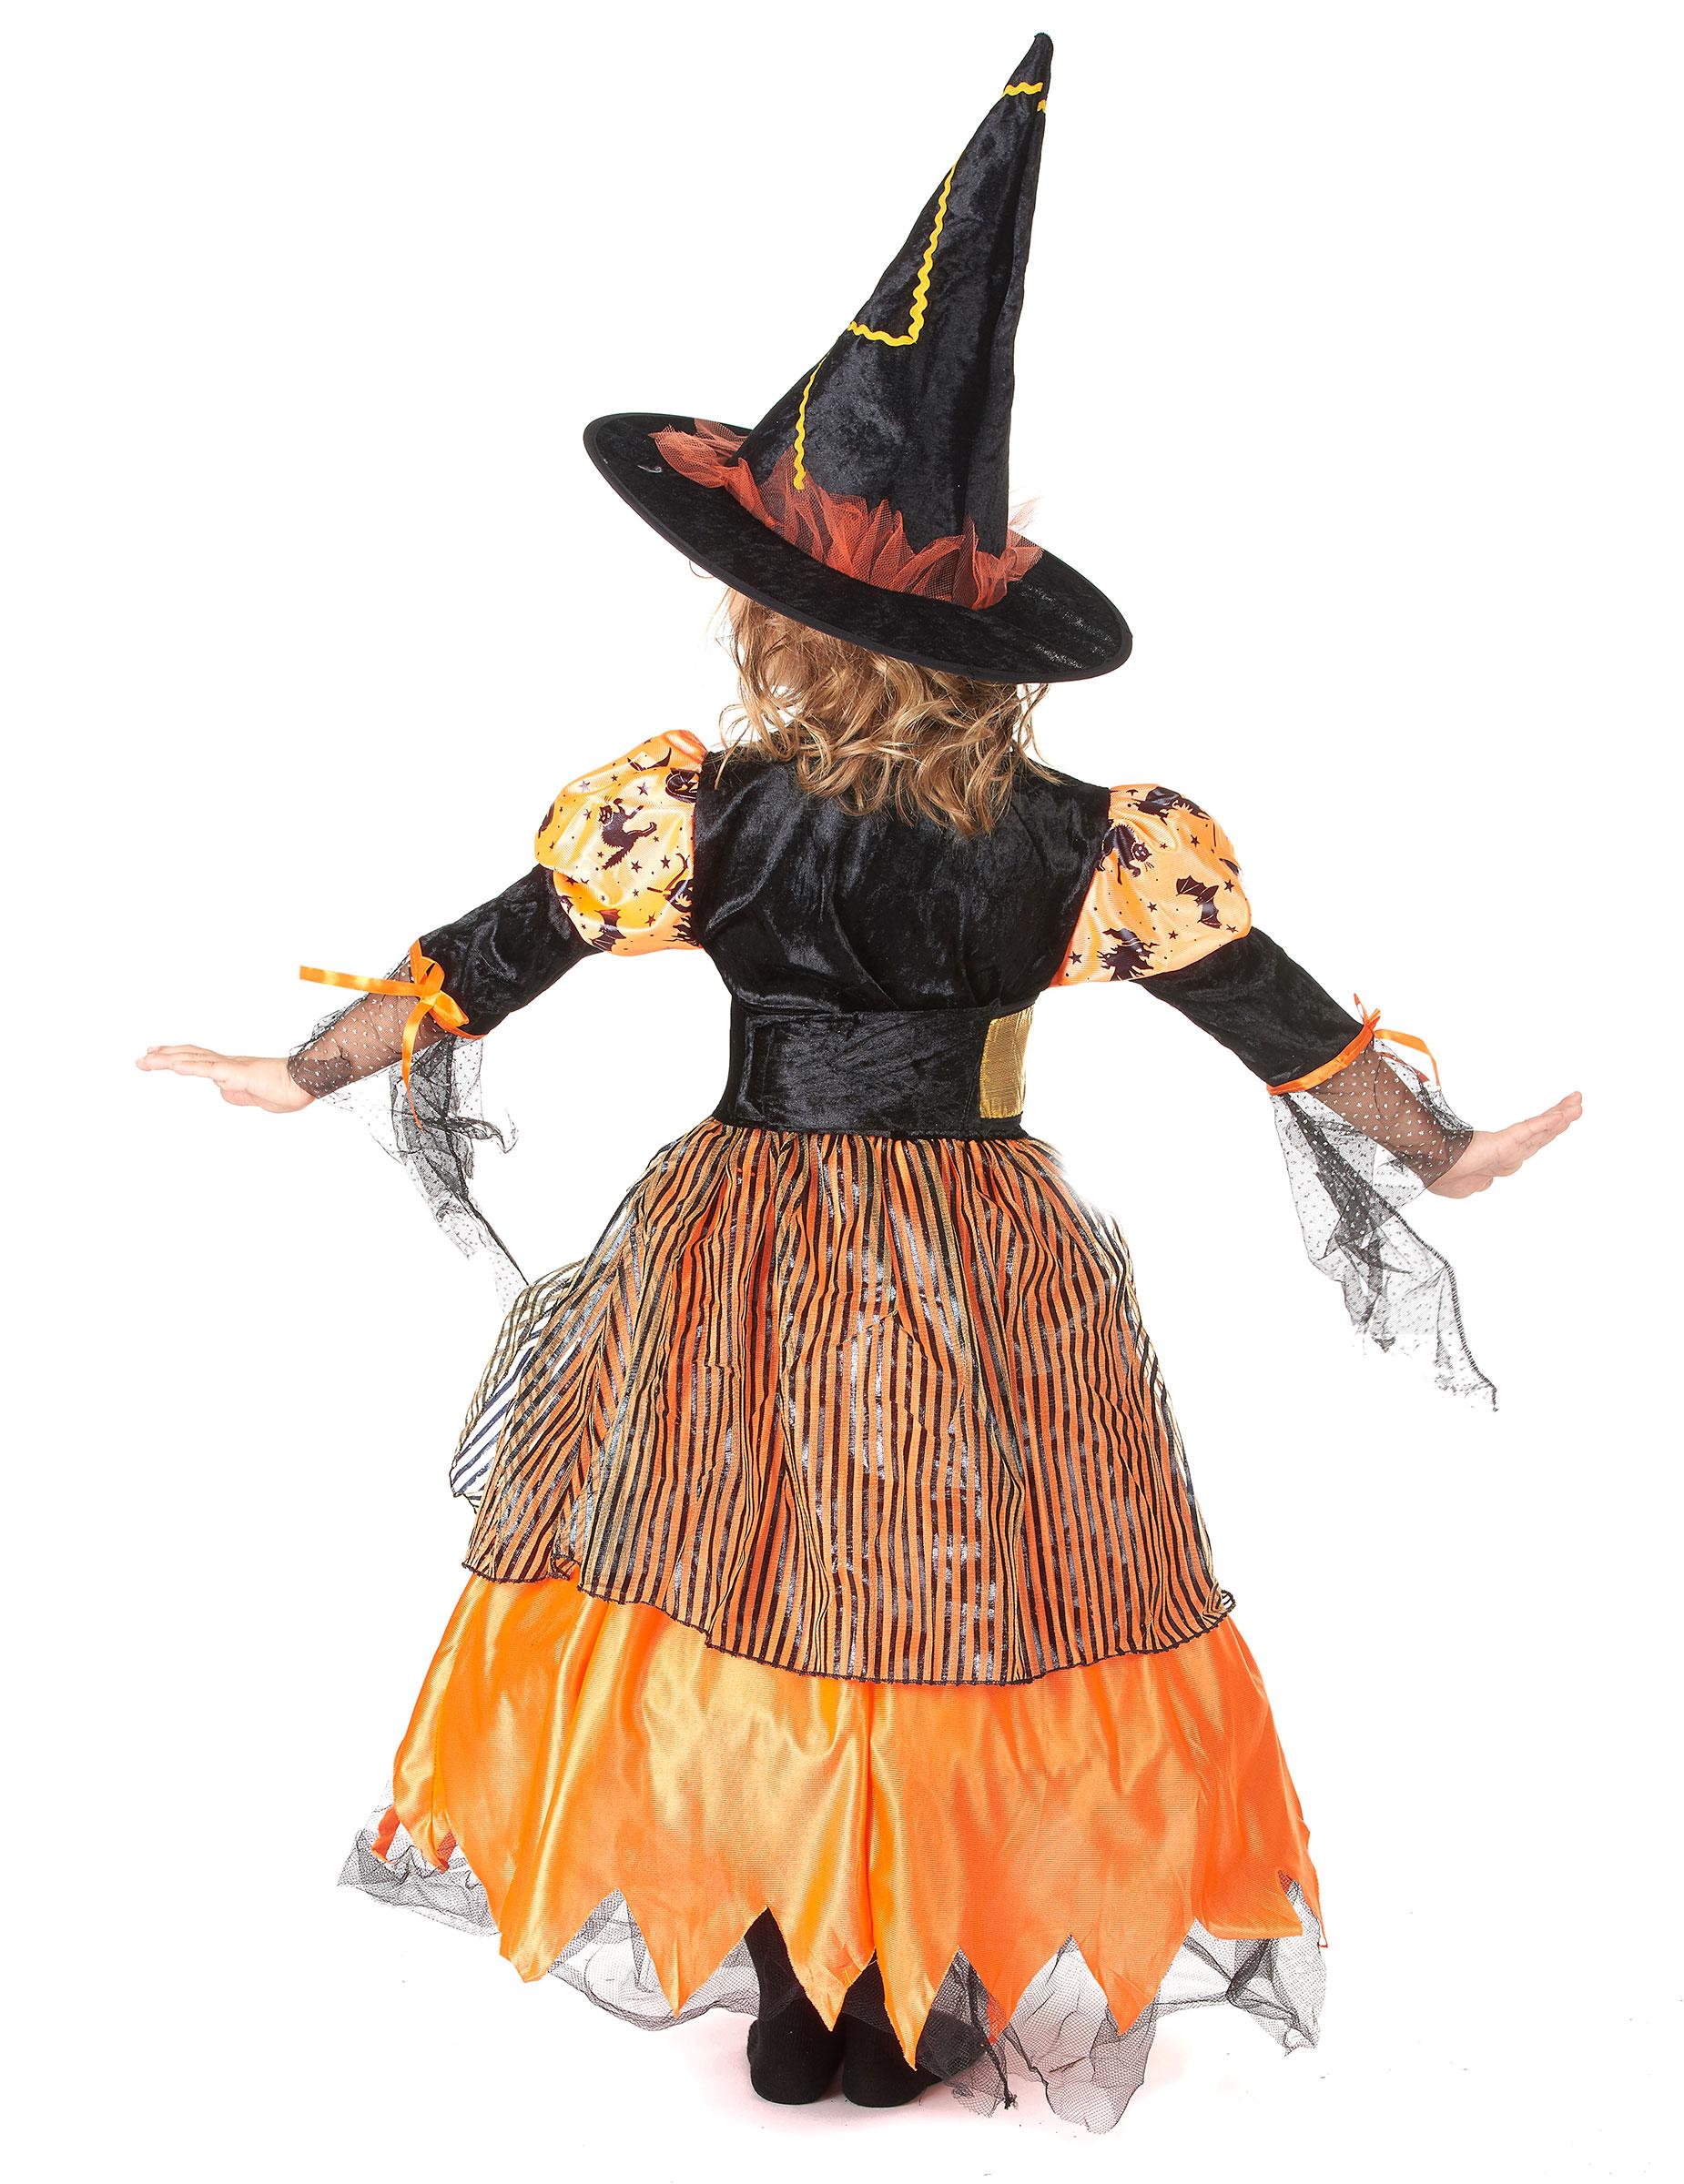 D guisement sorci re fille halloween deguise toi achat de d guisements enf - Deguisetoi fr halloween ...